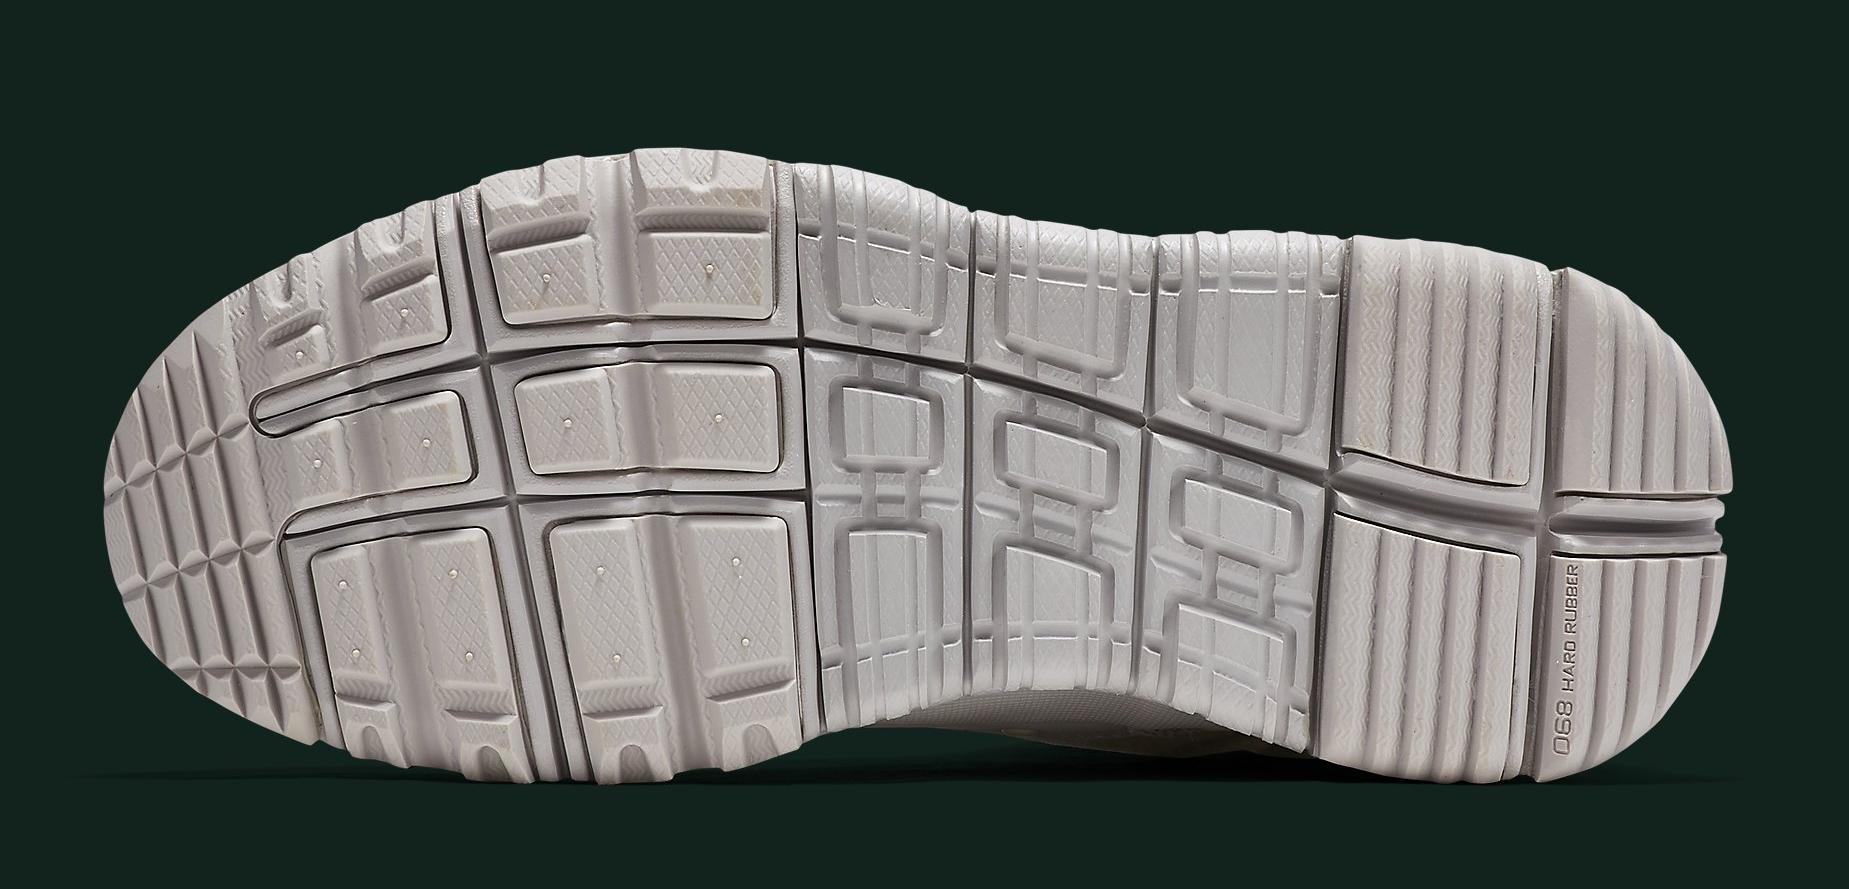 Pendleton Nike SFB 6 Inch Boot 875040-101 Sole